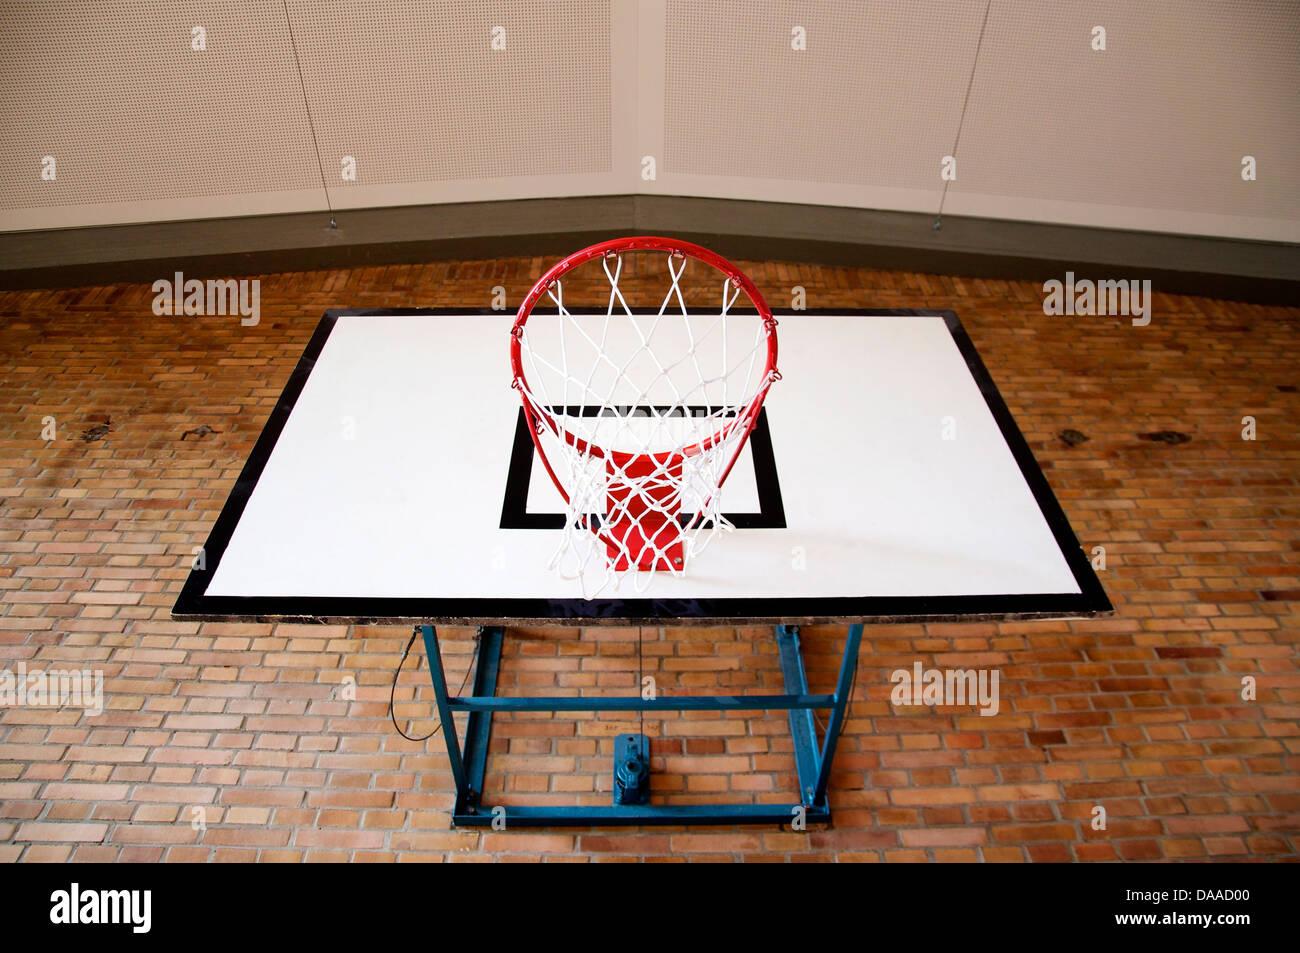 Basketball Hoop Inside A Gym Seen From Below Stock Photo 58007376